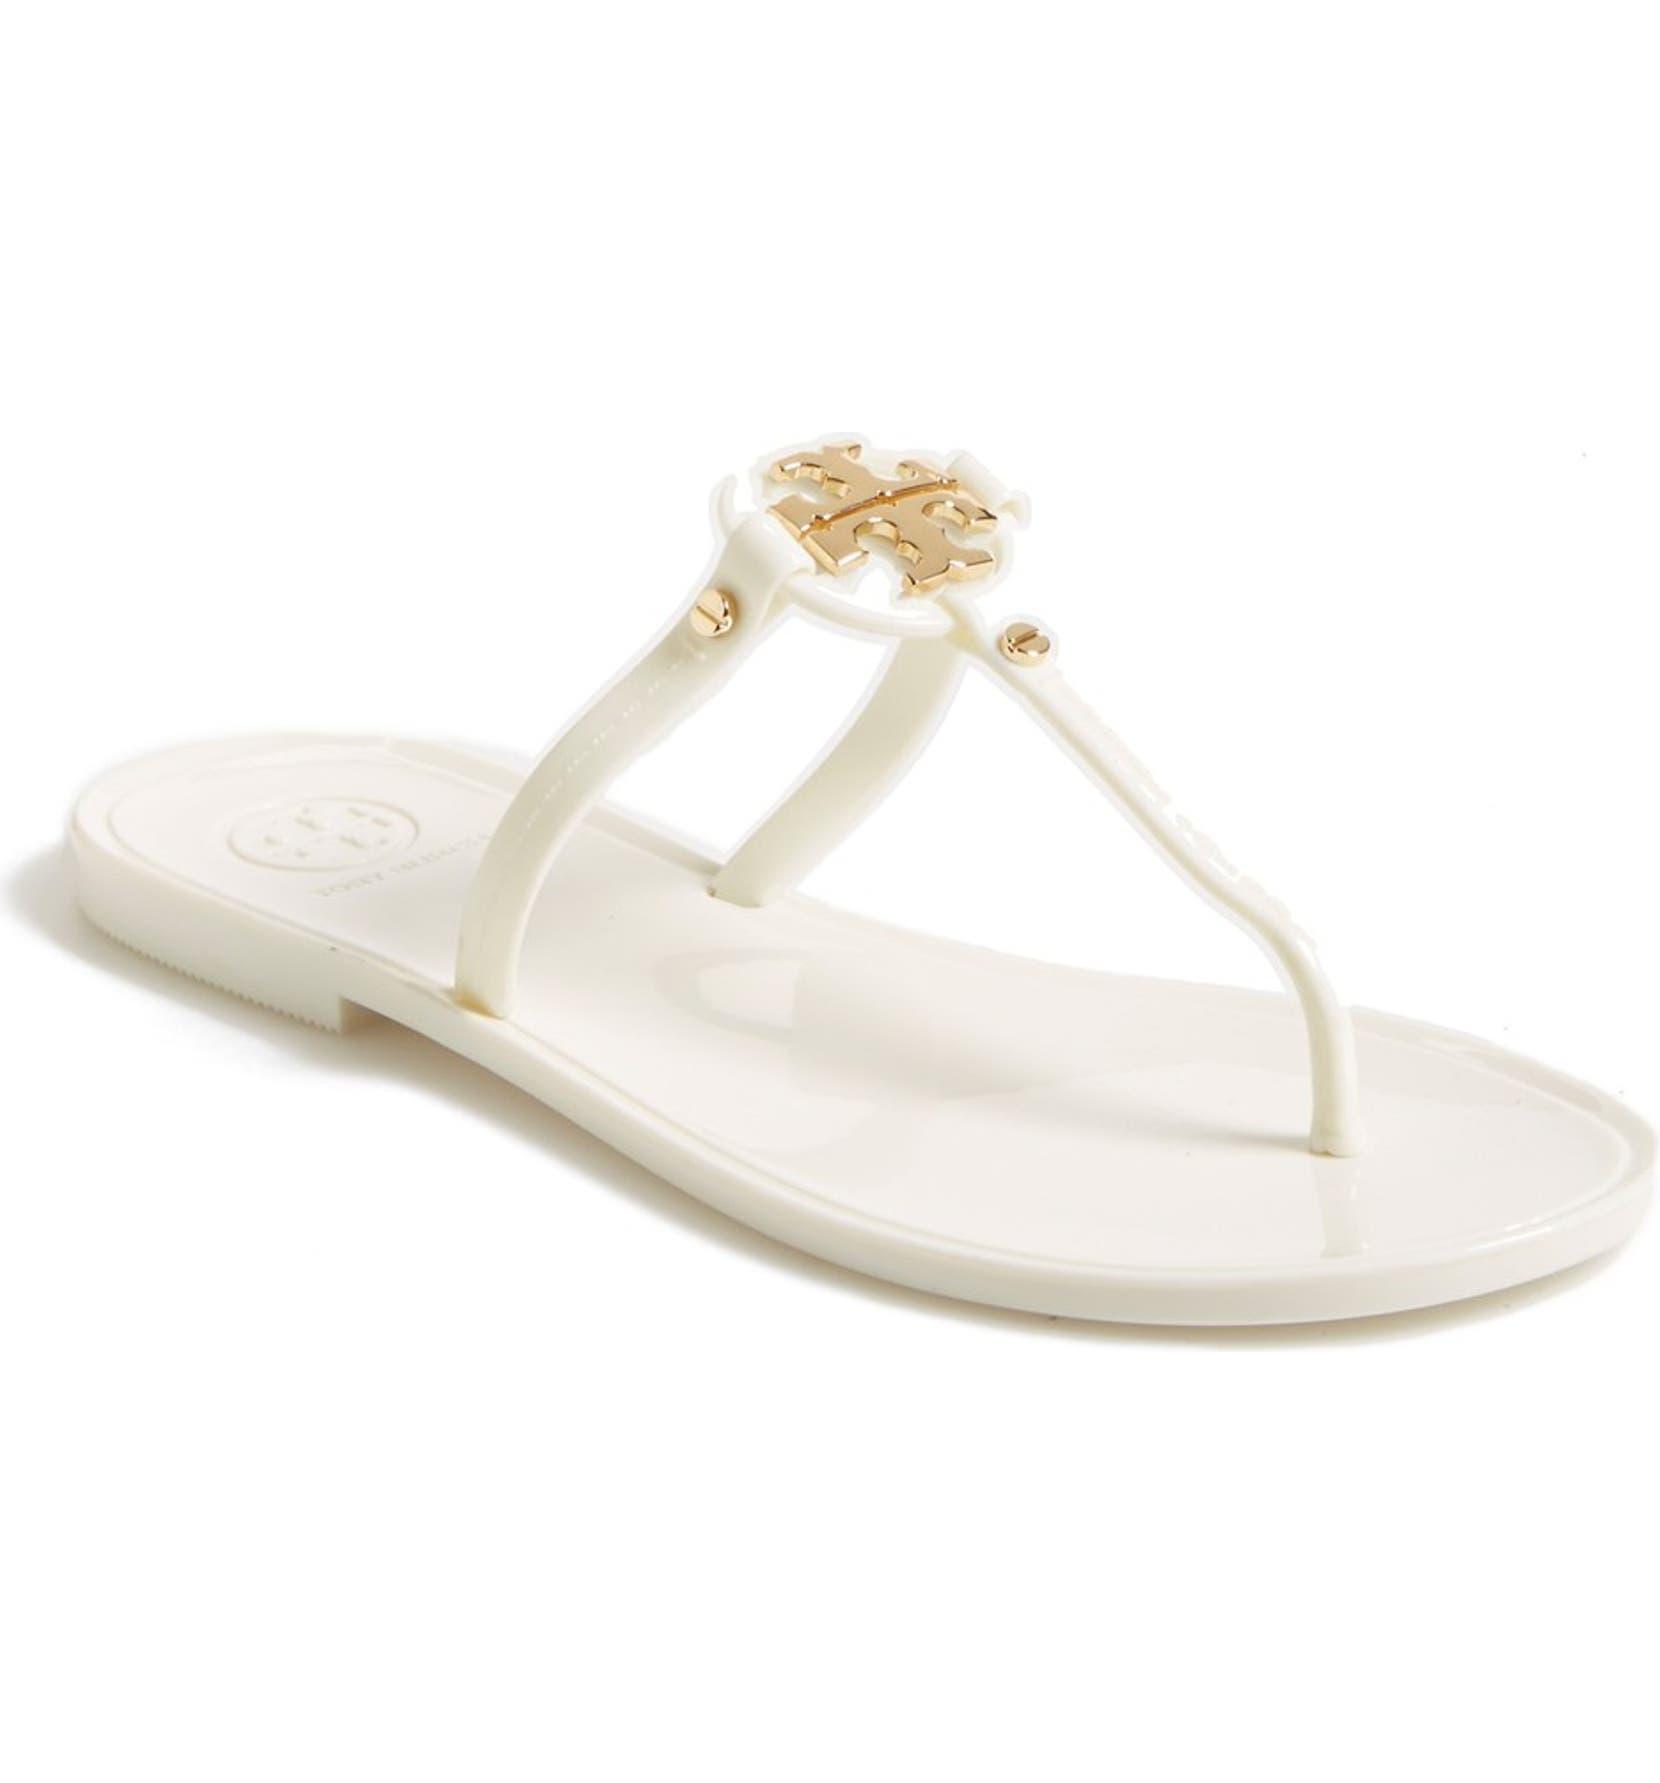 42154e6f1 Tory Burch  Mini Miller  Flat Sandal (Women)